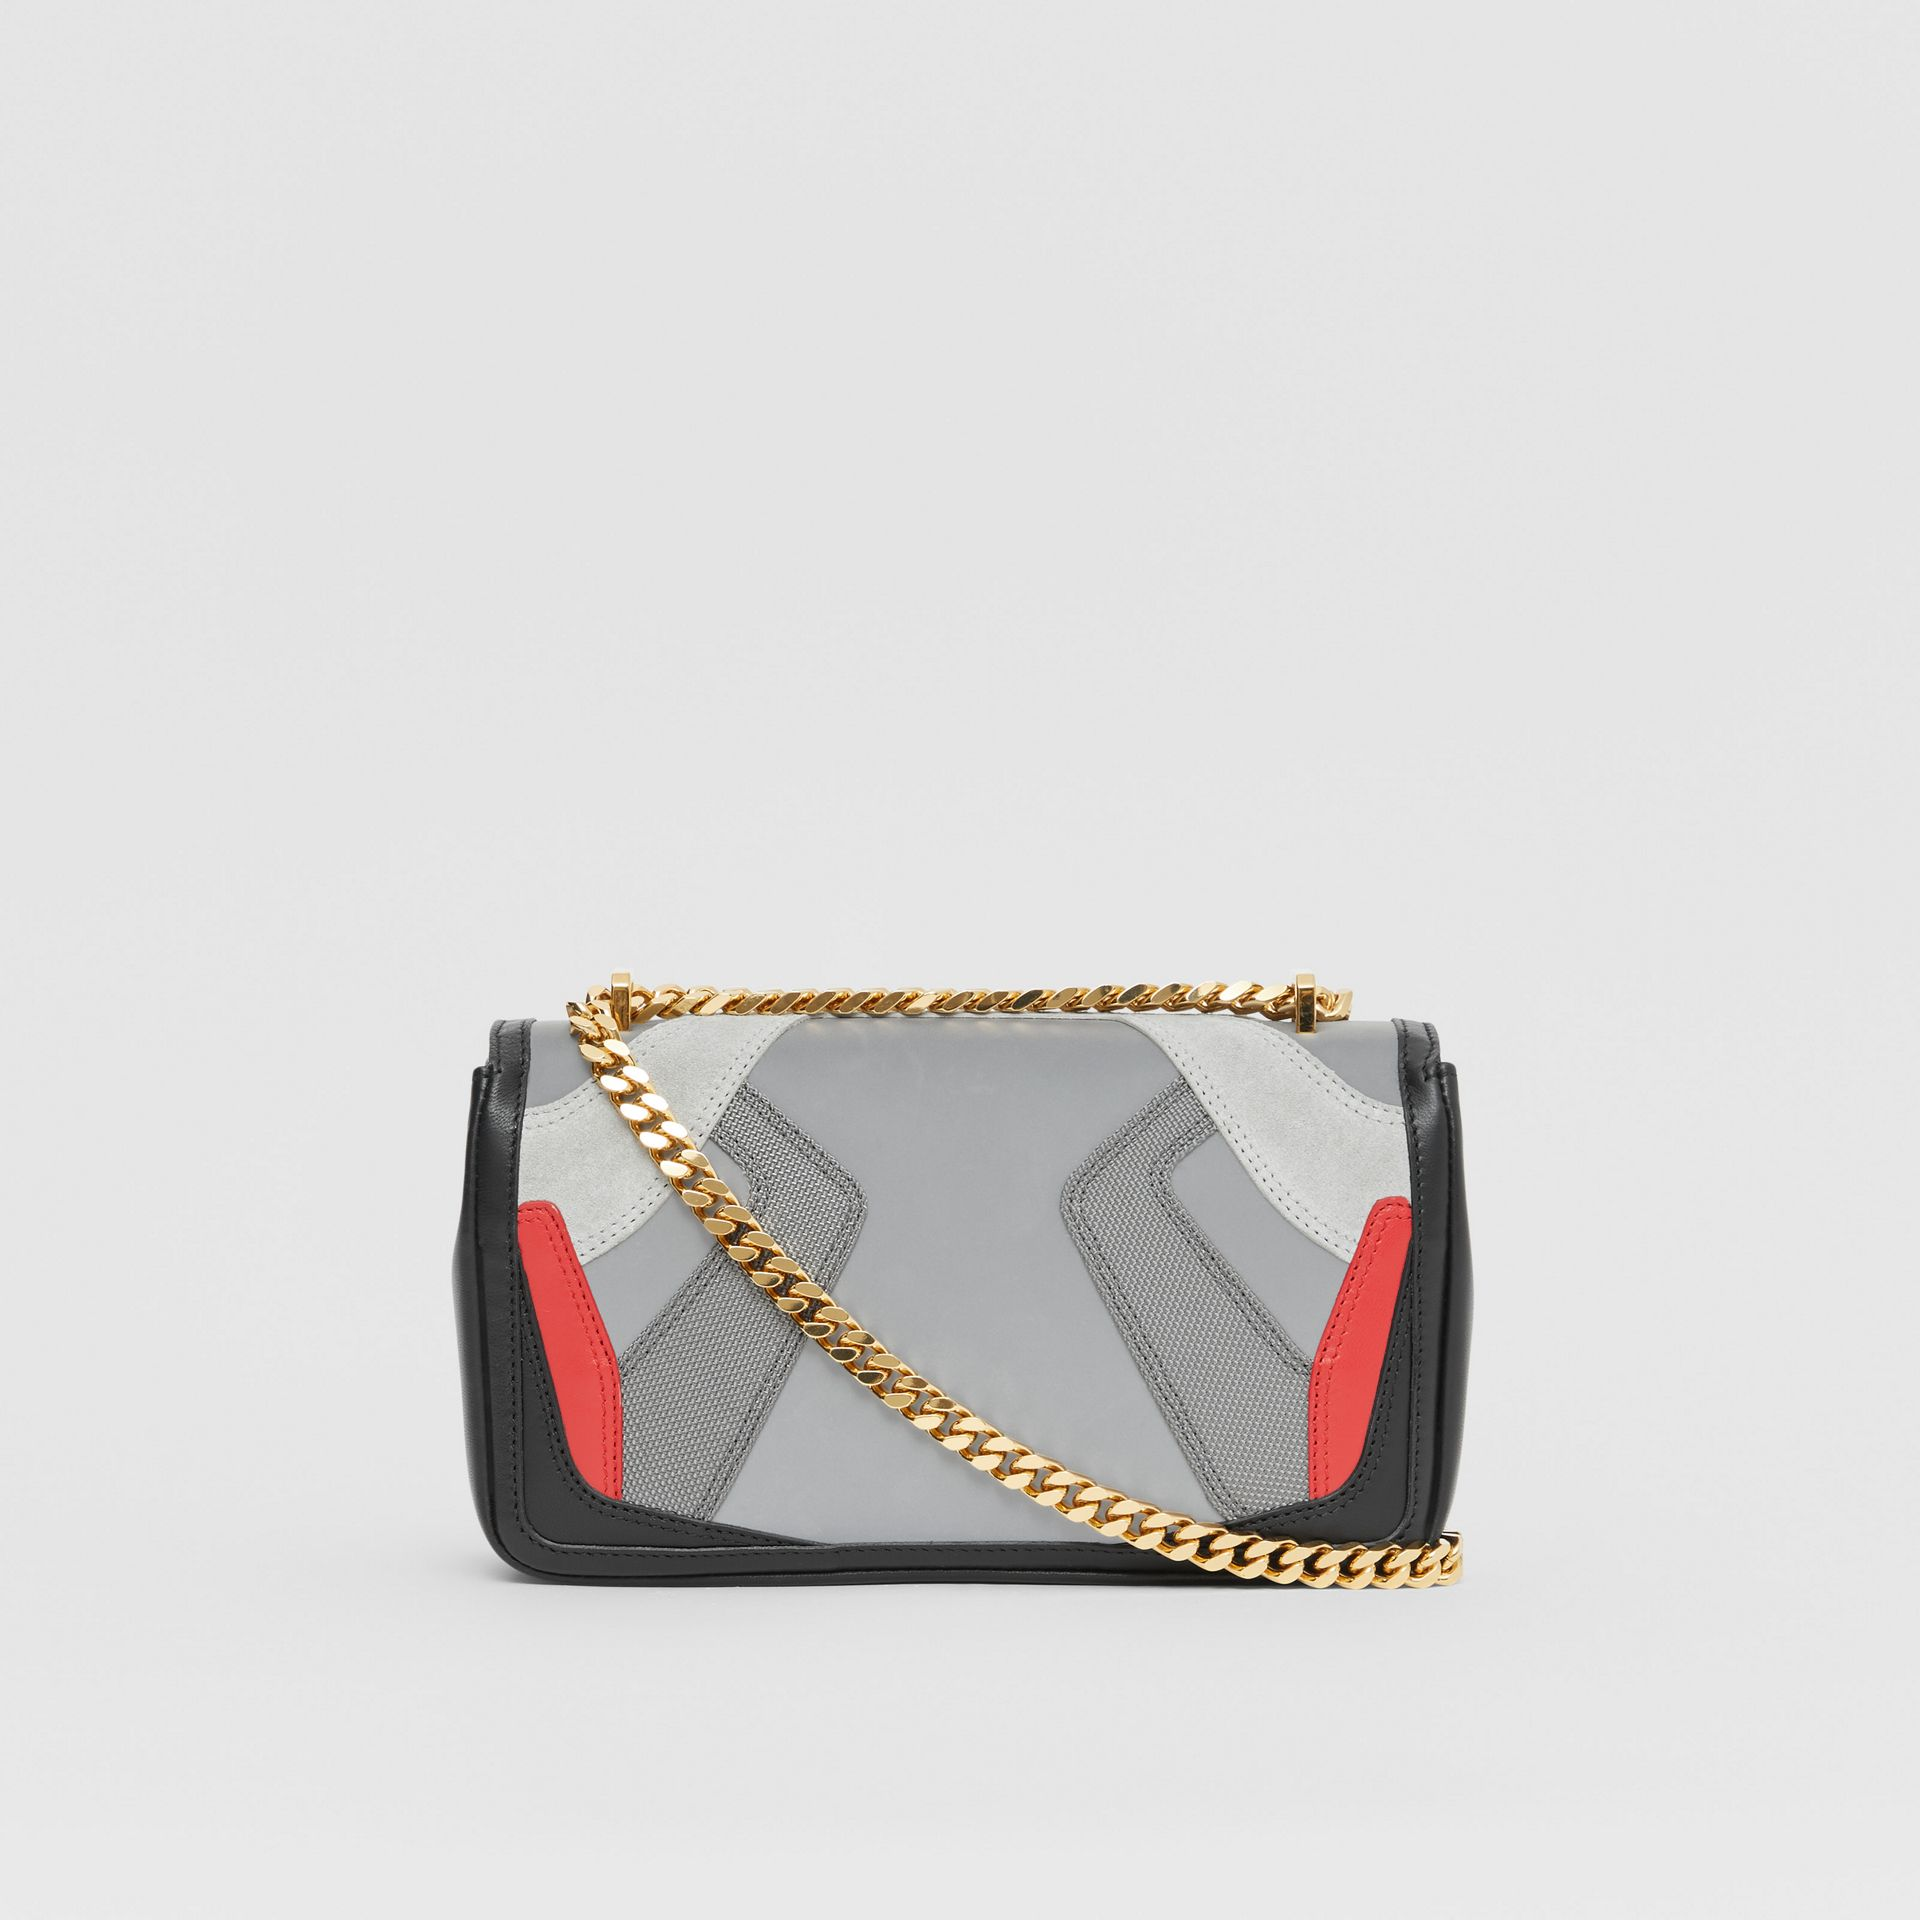 Small Appliqué Leather Lola Bag in Multicolour - Women | Burberry - gallery image 5